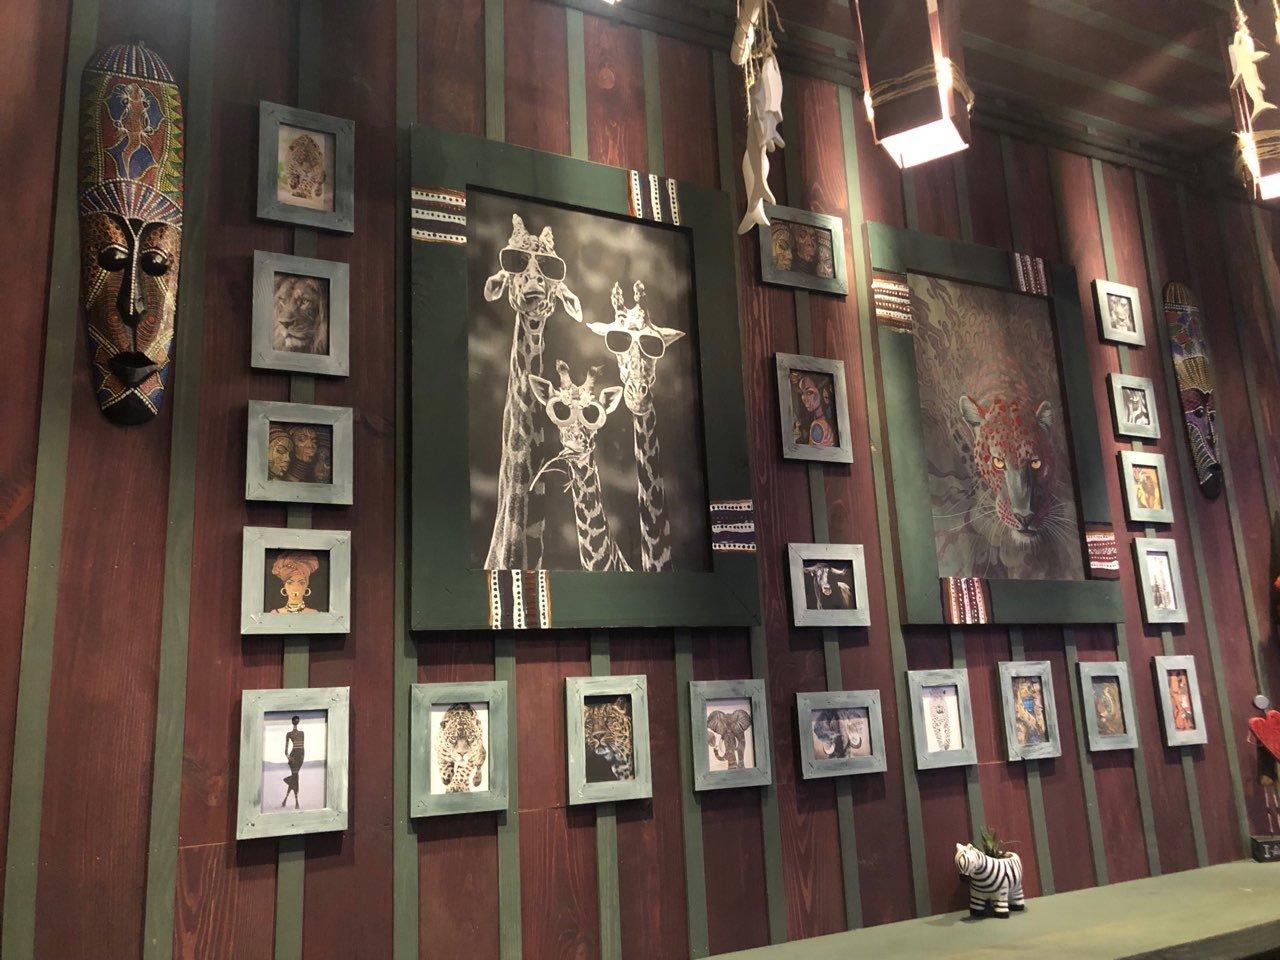 Кохання з присмаком кави: де у Хмельницькому провести День закоханих, фото-5